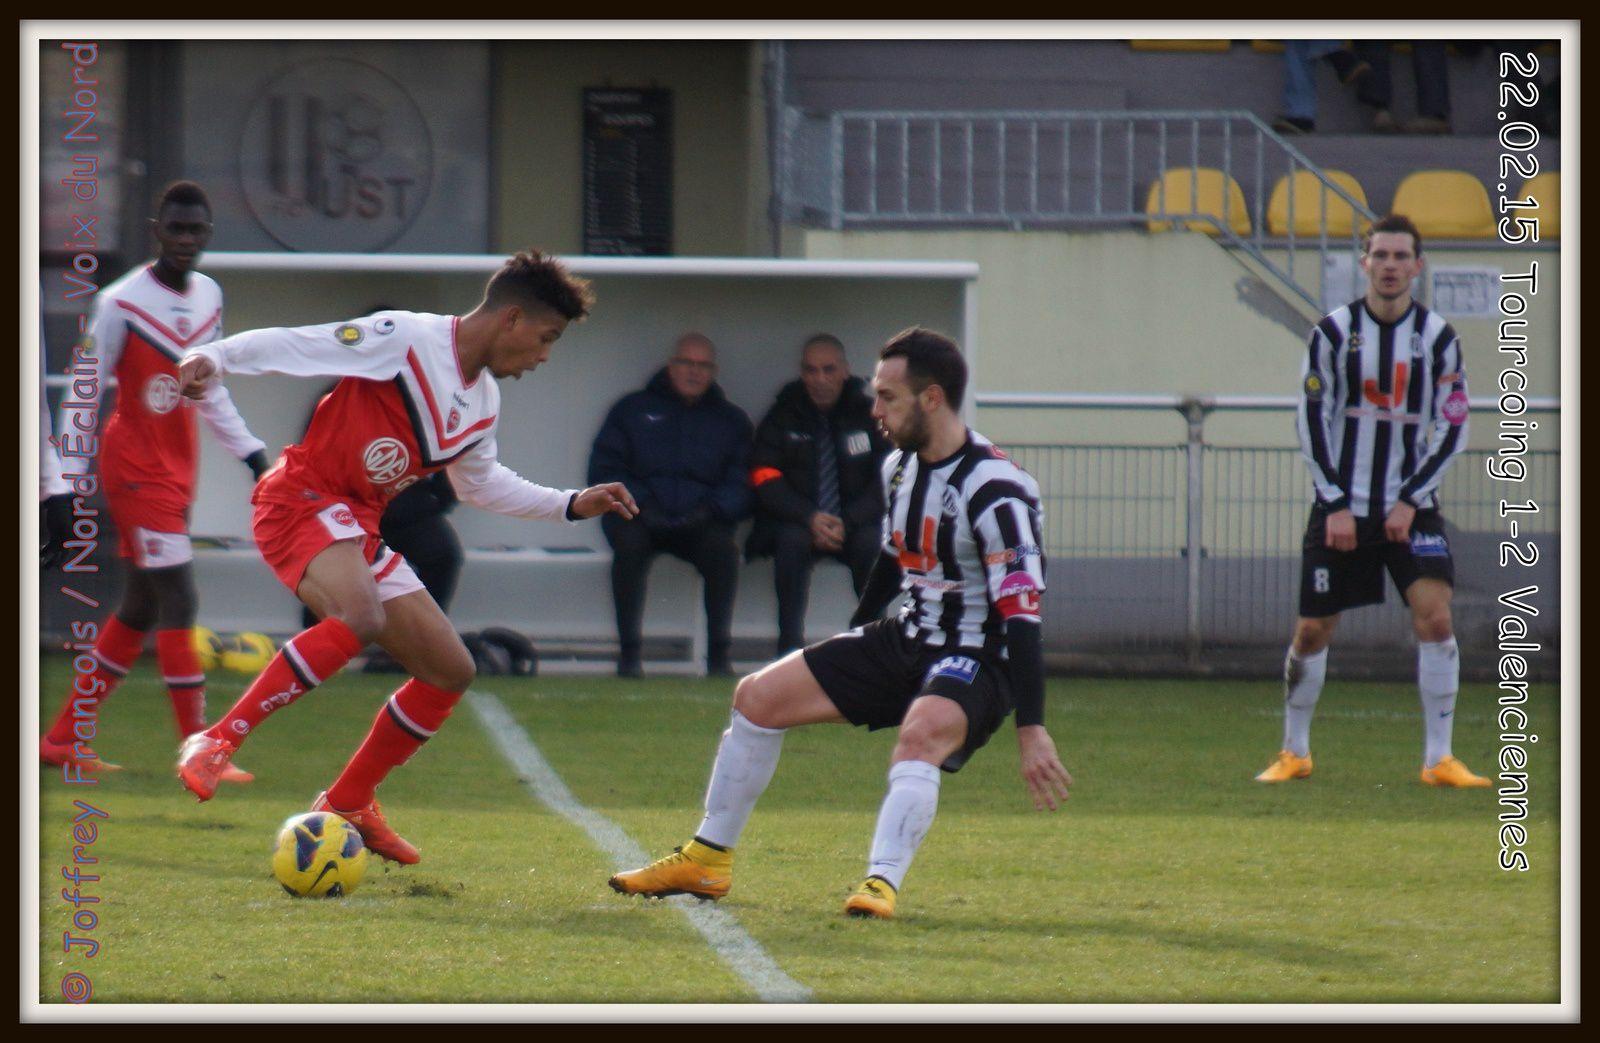 22.02.15 CFA 2 Tourcoing - Valenciennes